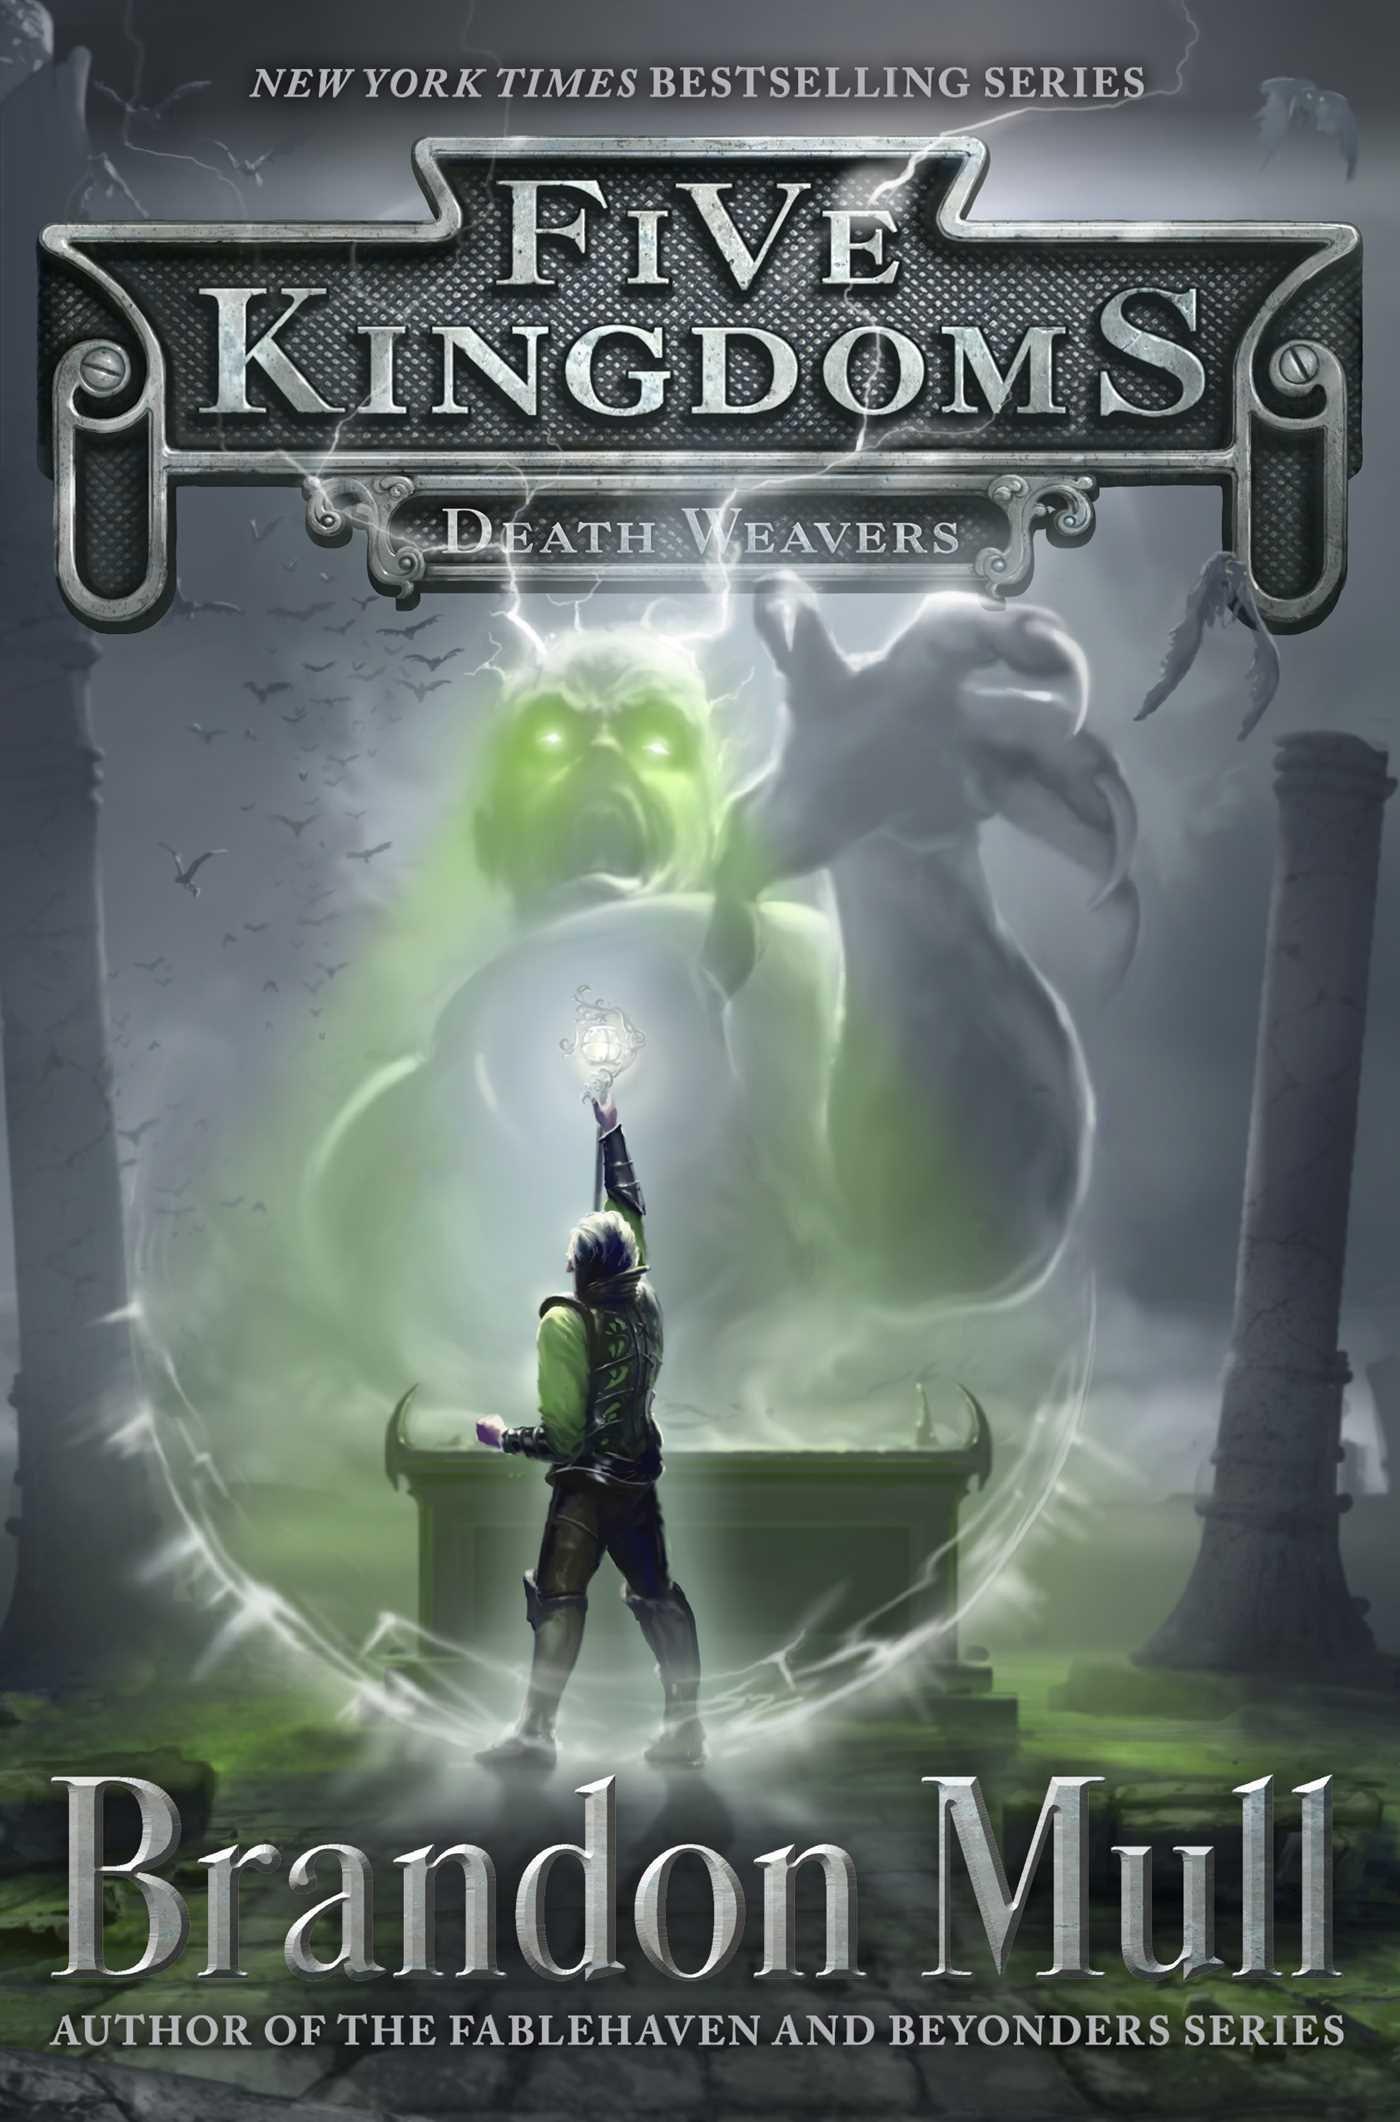 Death Weavers (Five Kingdoms): Brandon Mull: 9781442497108: Amazon ...